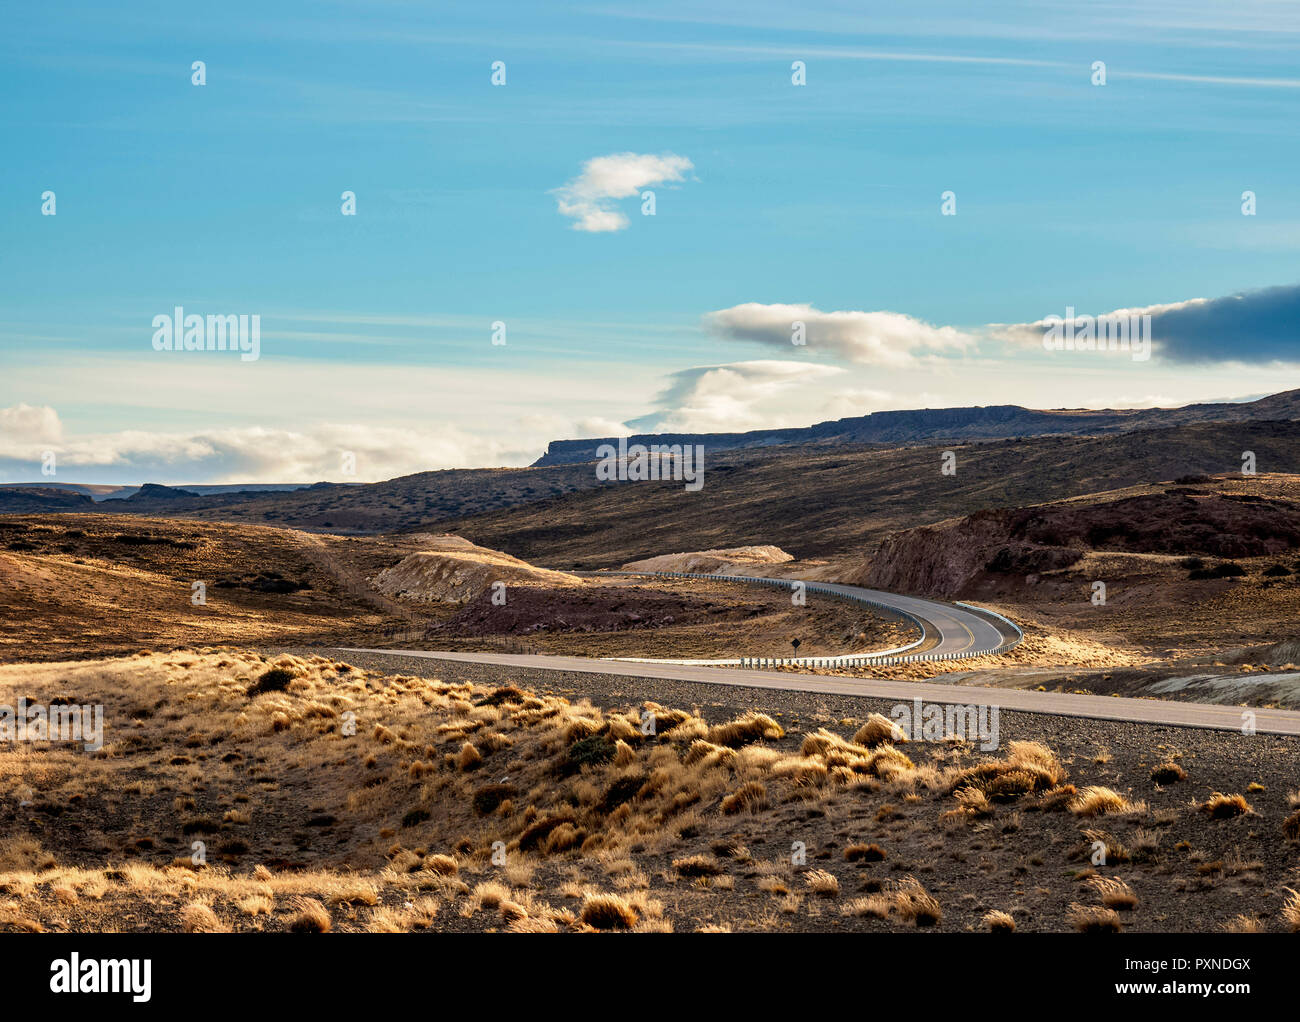 Ruta 40 near Perito Moreno Town, Santa Cruz Province, Patagonia, Argentina - Stock Image